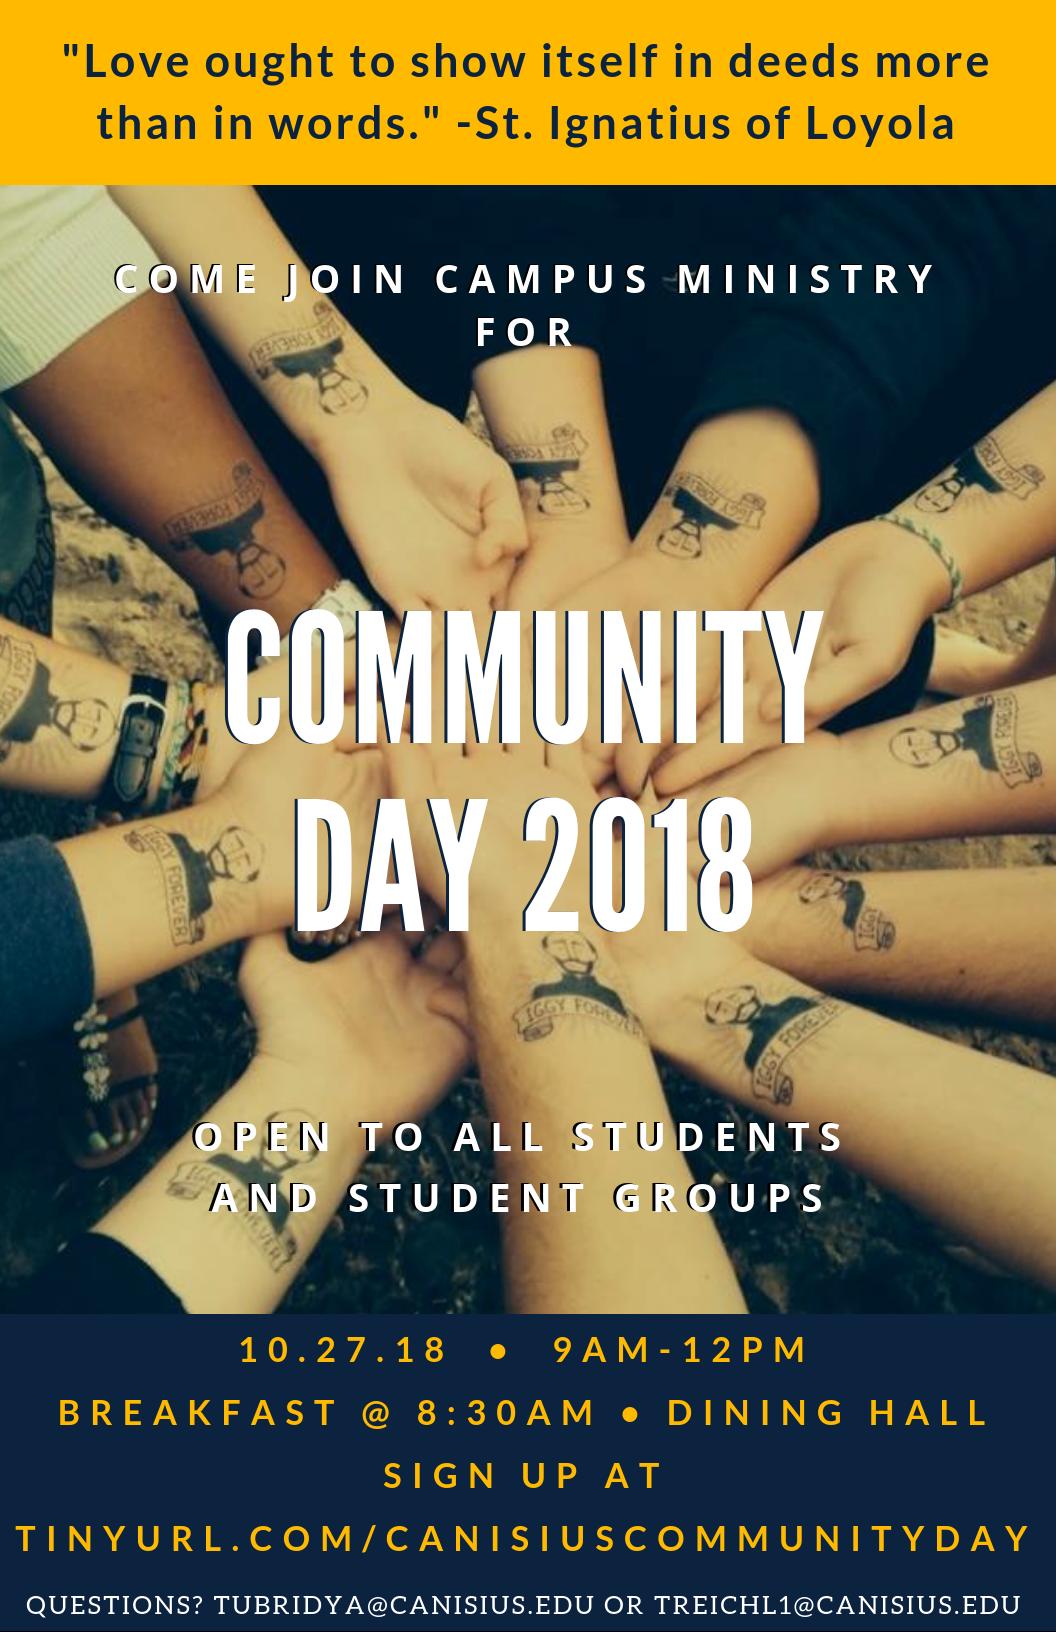 COMMUNITYDay 2018.png